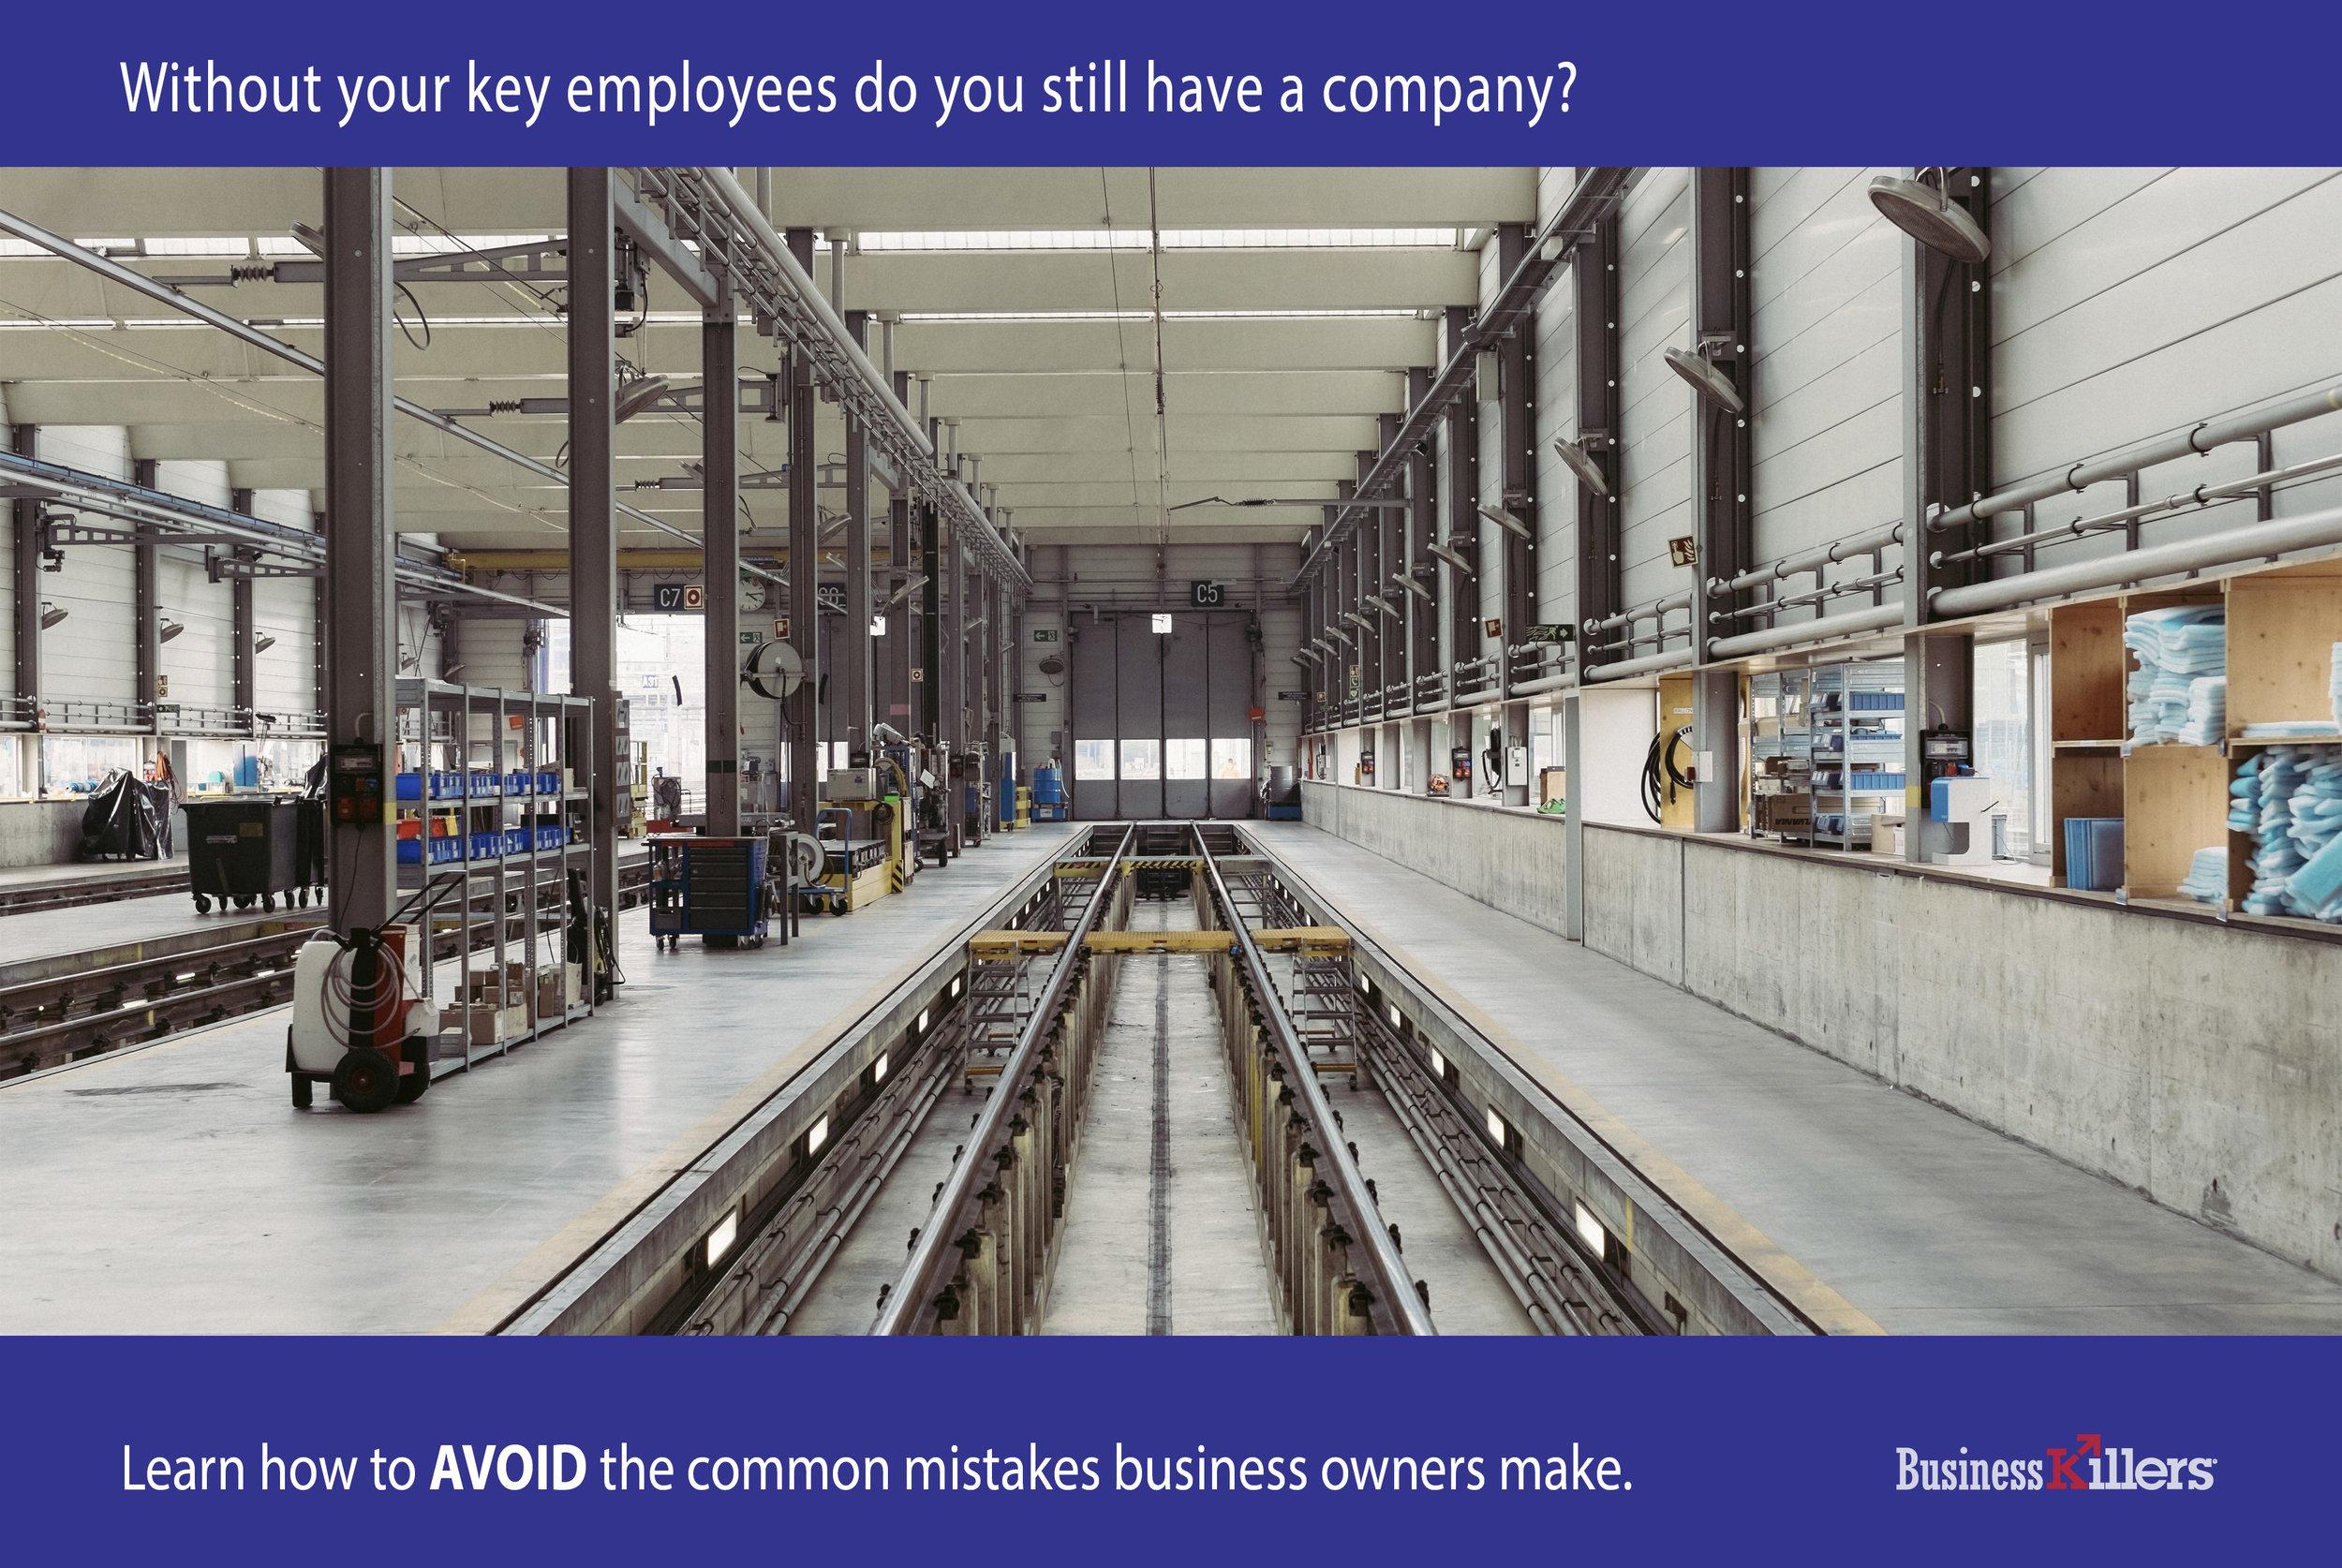 Key_Employees2.jpg